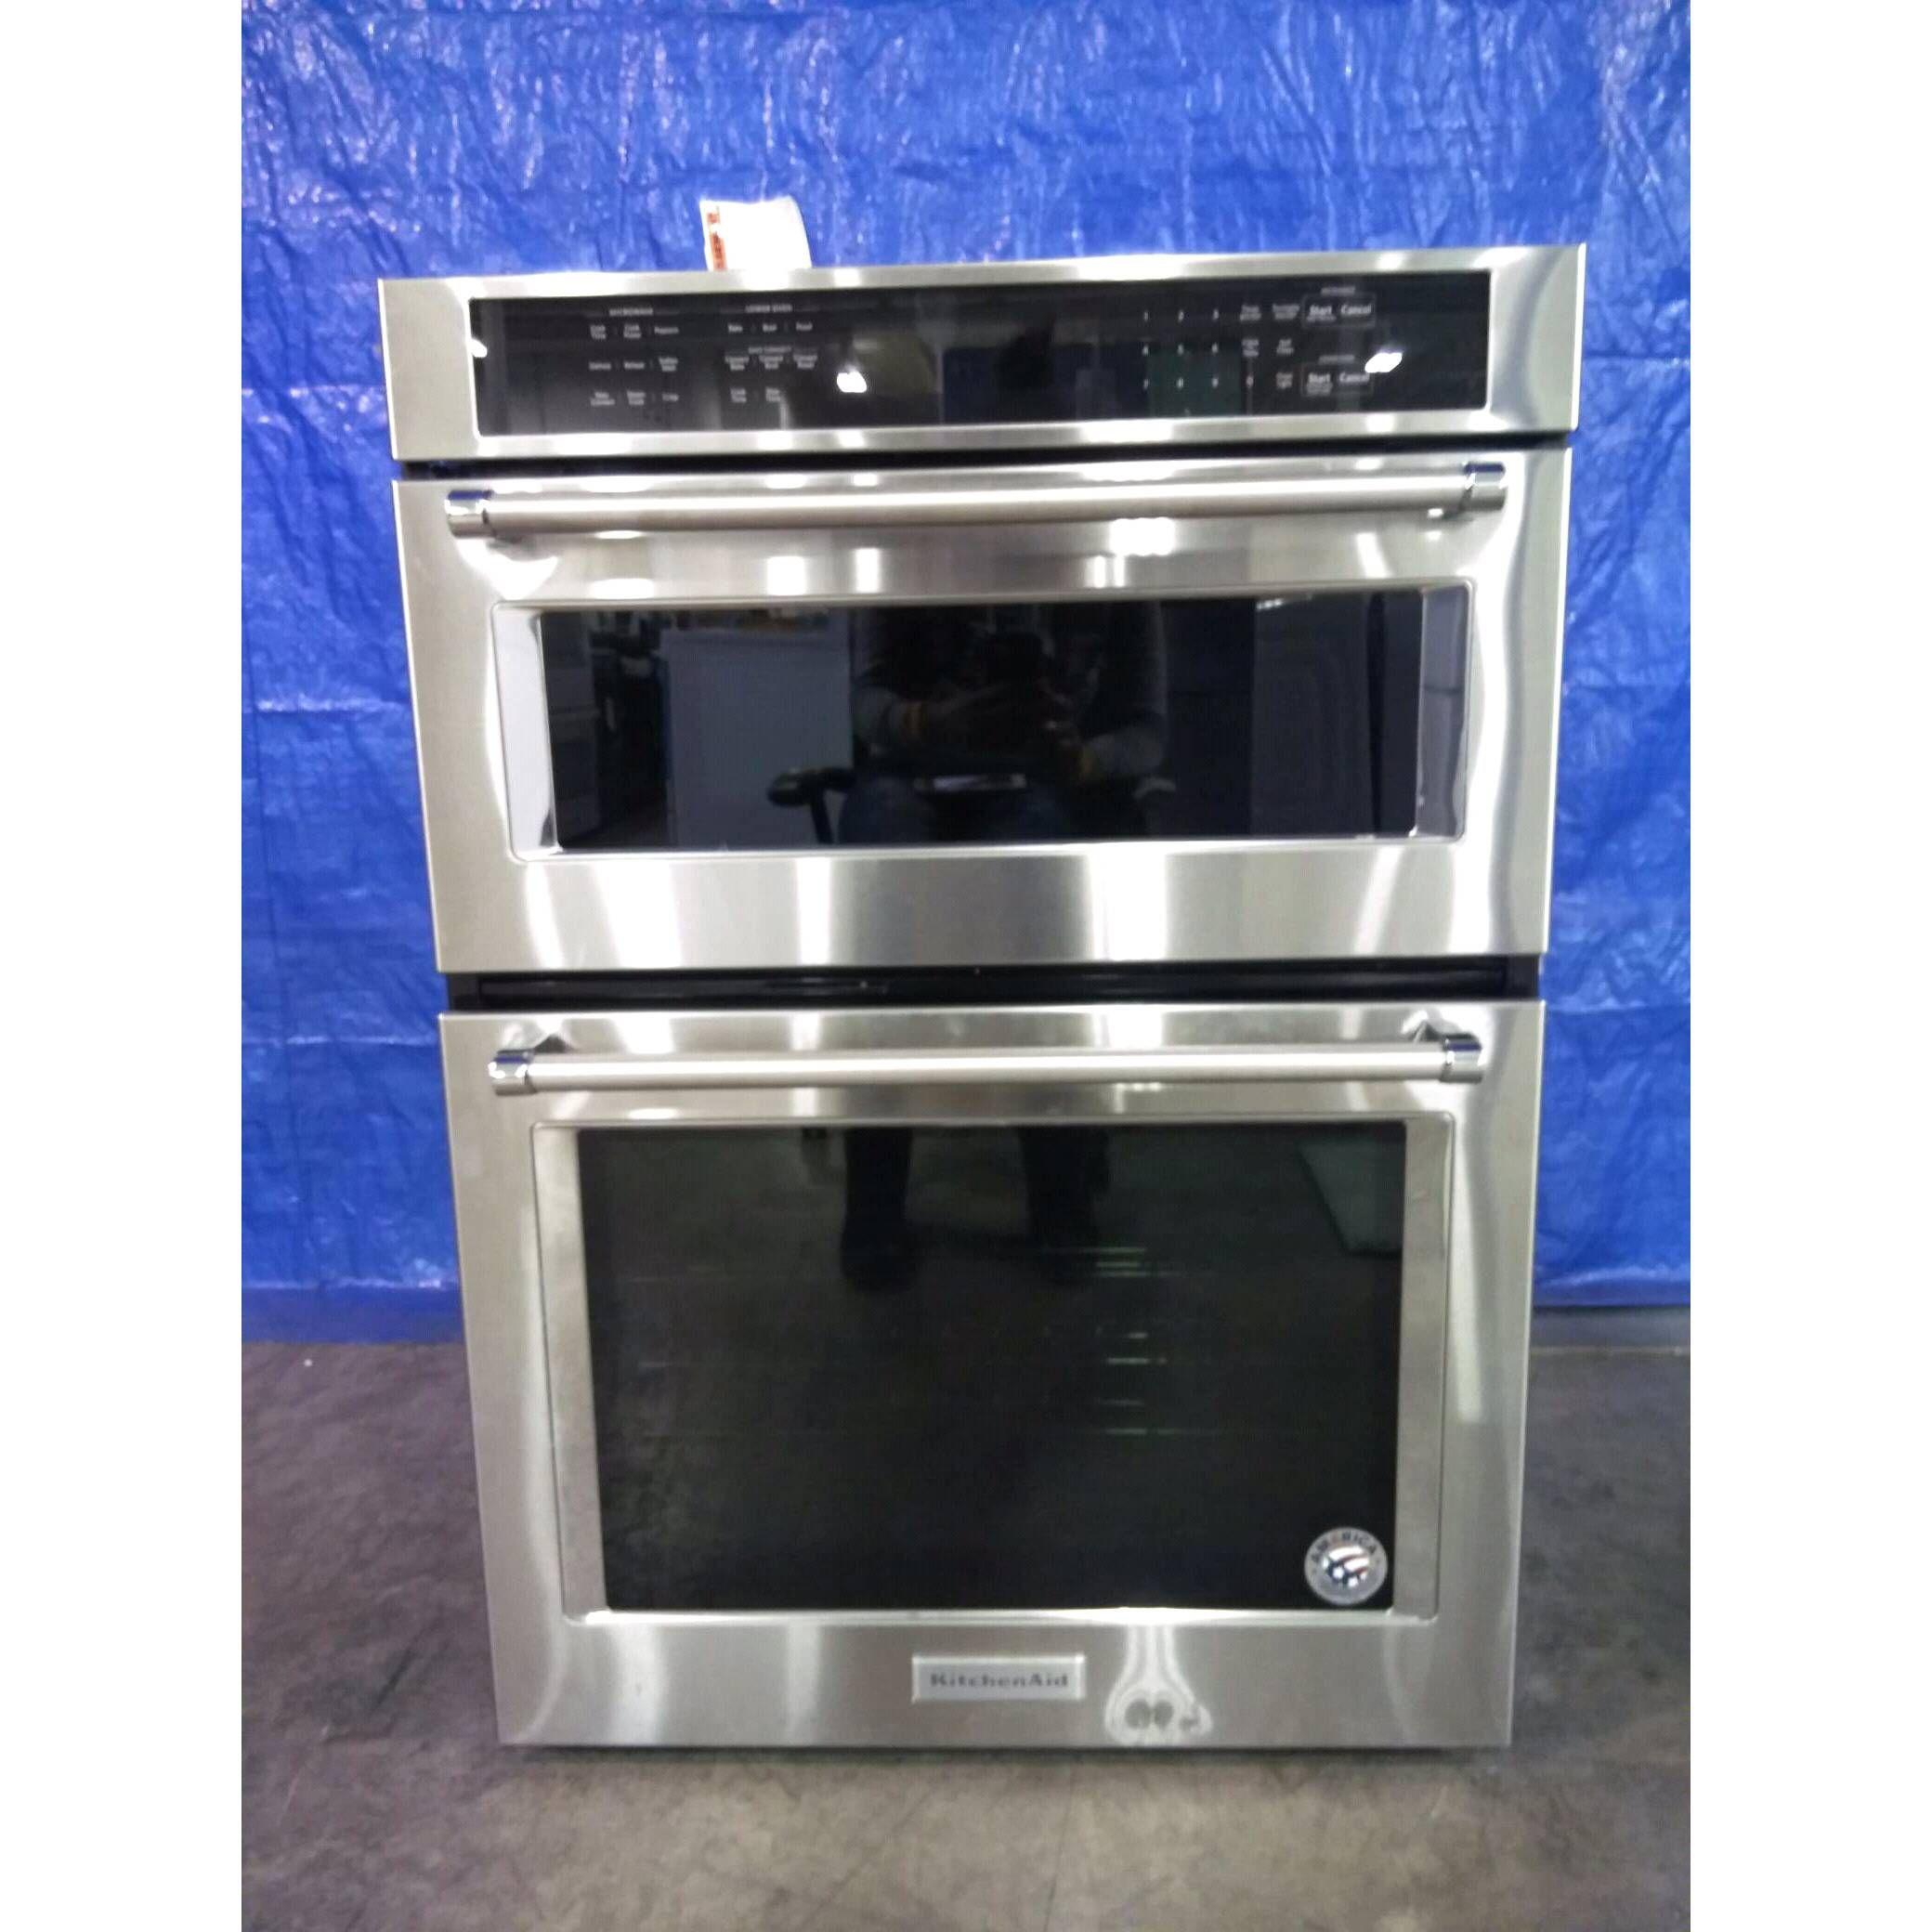 Kitchenaid koce500ess 30 combination wall oven w even